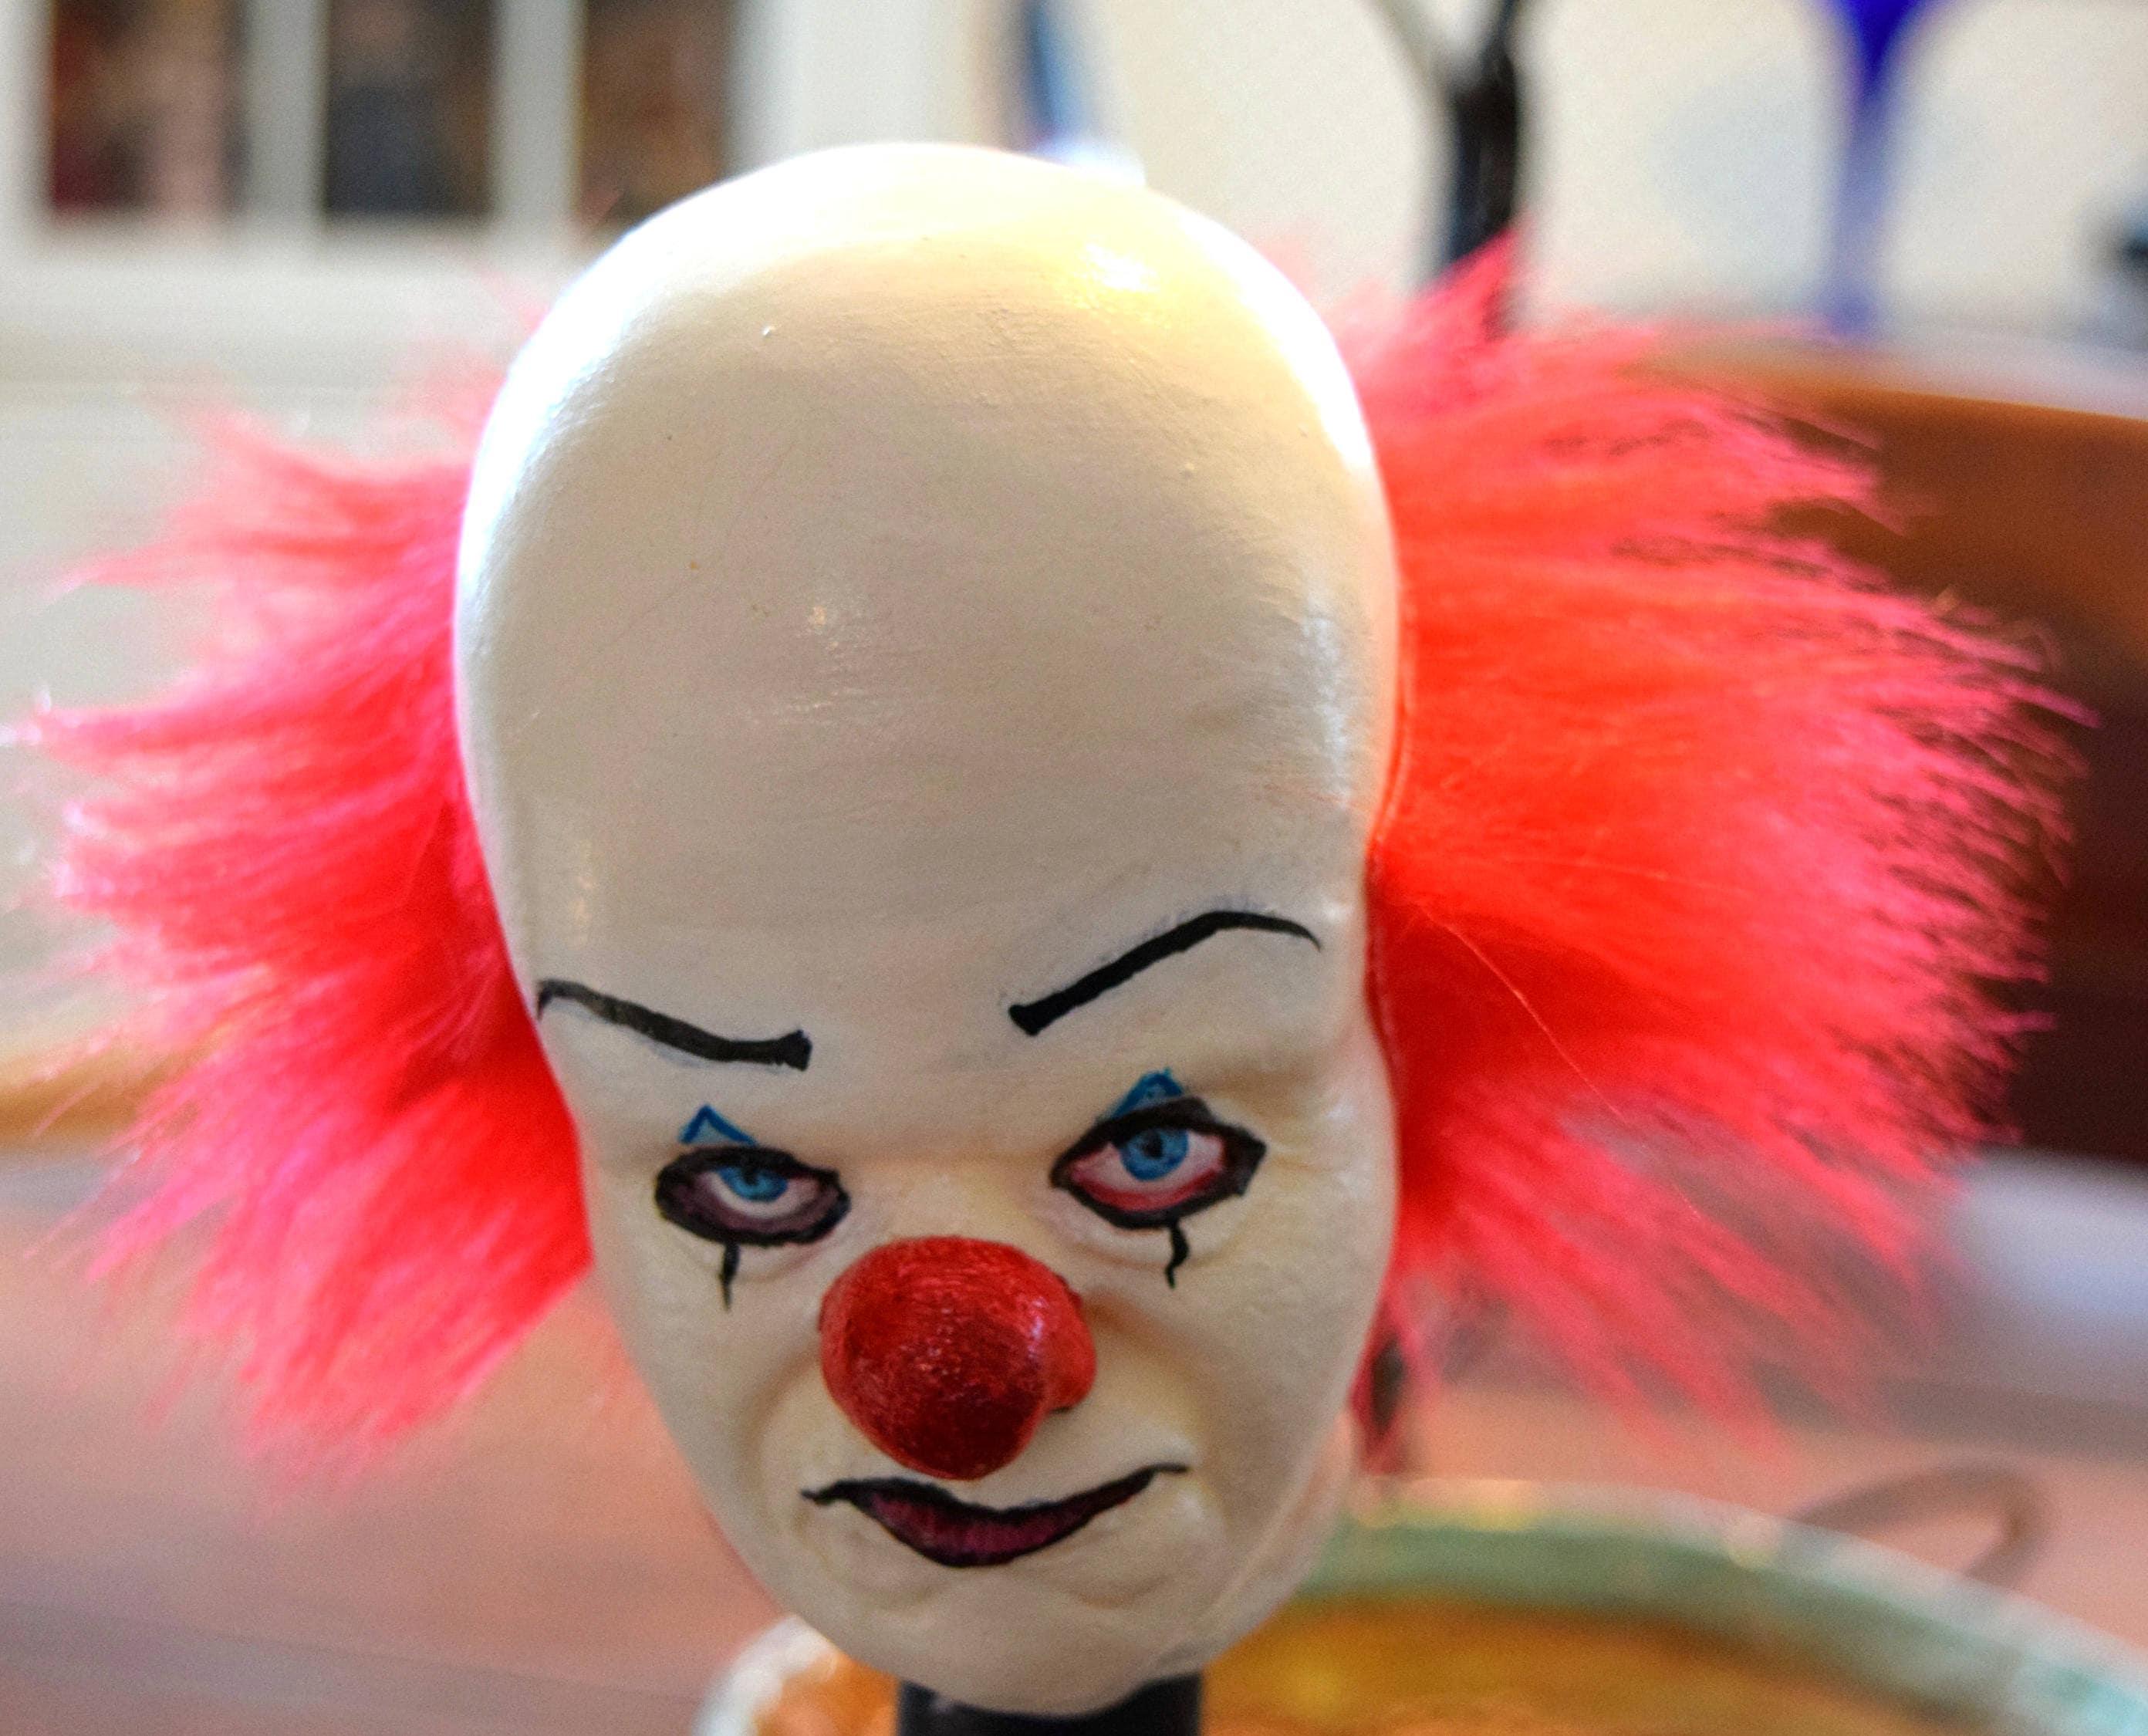 Stephen King 20 Horror Doll Figure Bill Skarsgard Halloween Killer Klown PENNYWISE Killer Clown IT Movie Haunted Creepy Clown Cult